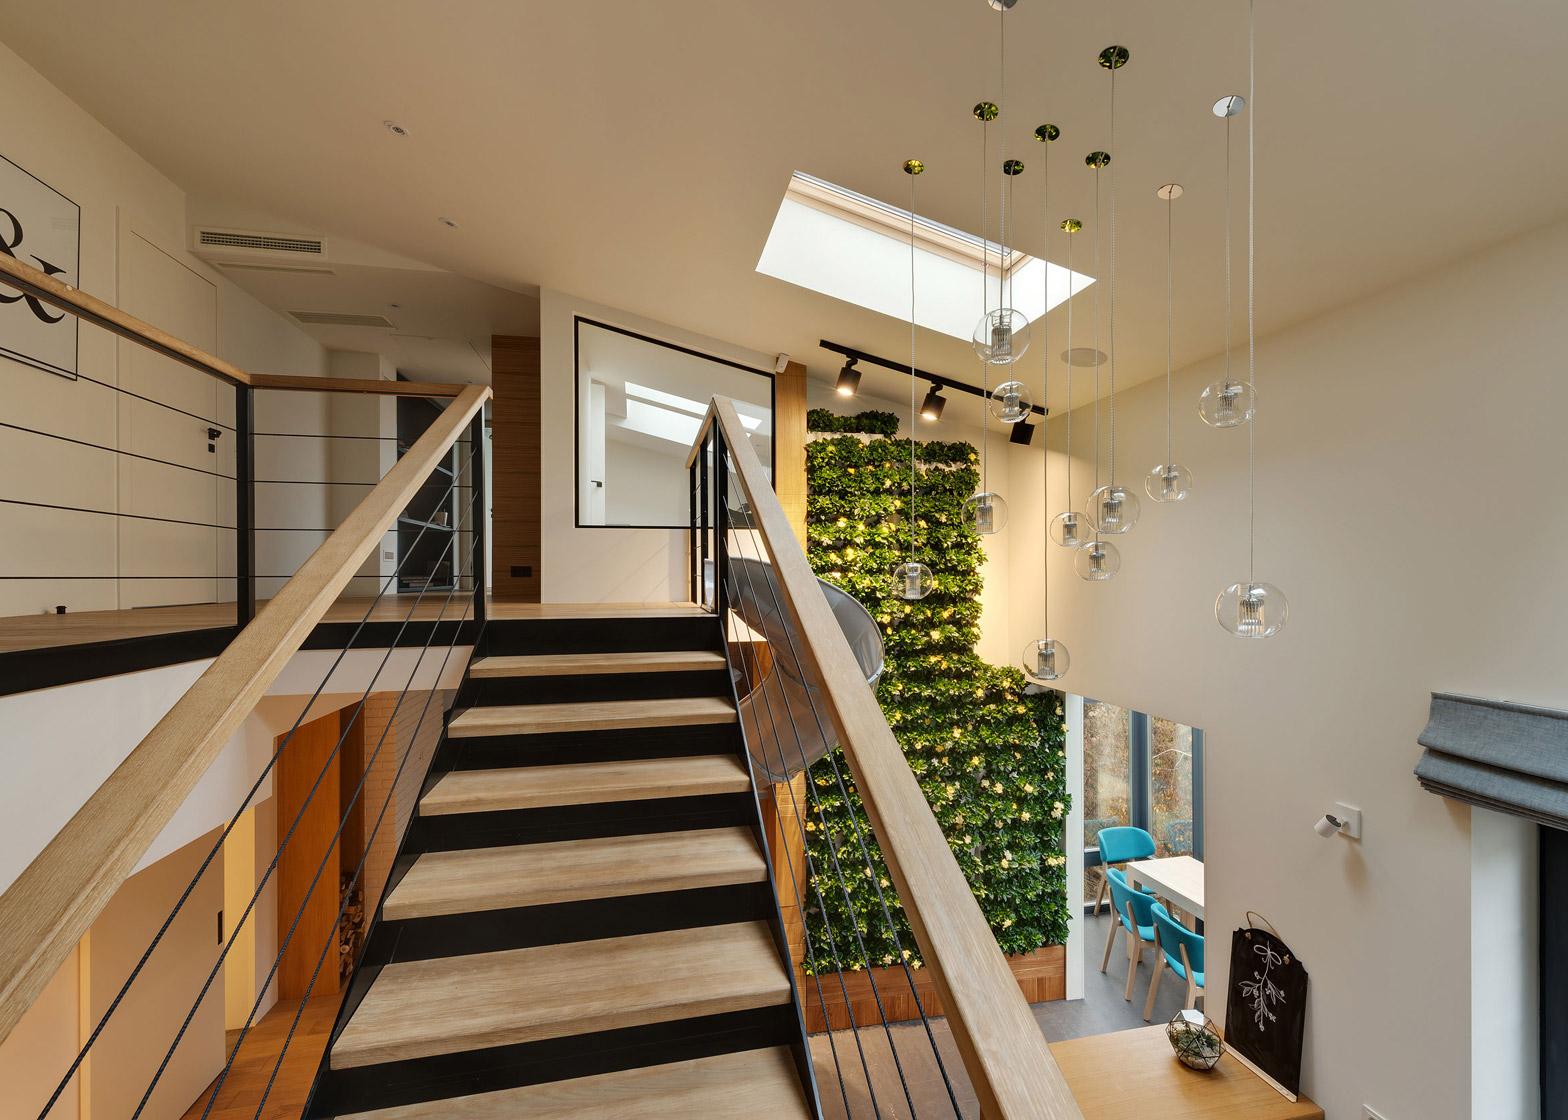 Apartment with a slide by KI Design Studio